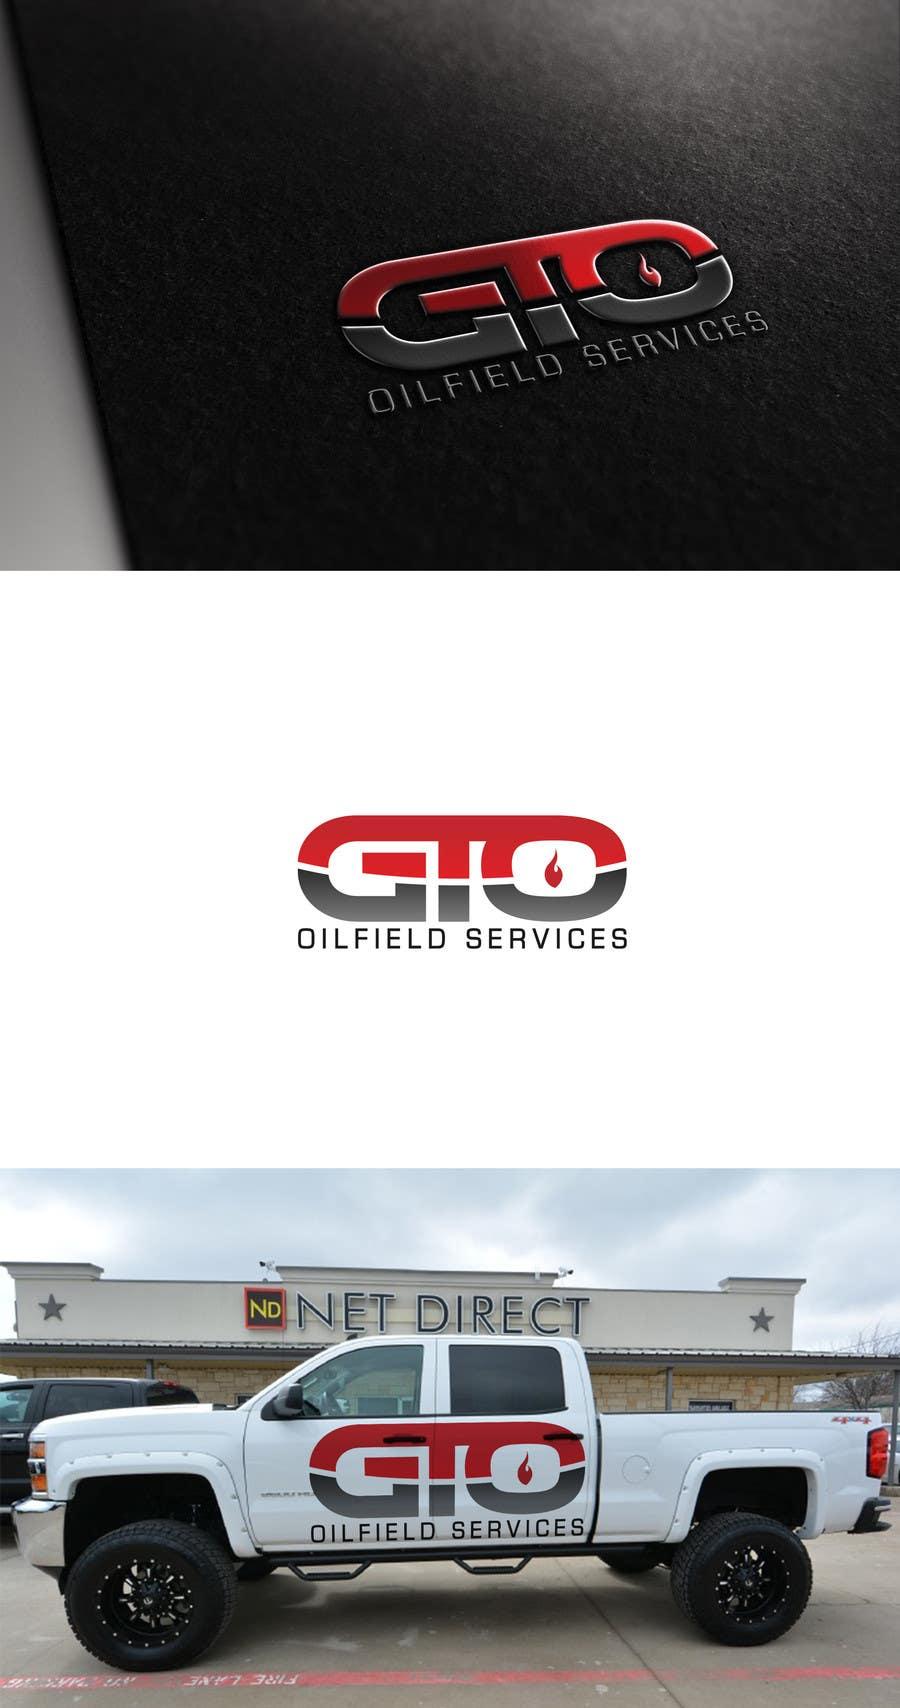 Kilpailutyö #9 kilpailussa Design a Logo for an Oilfield Company